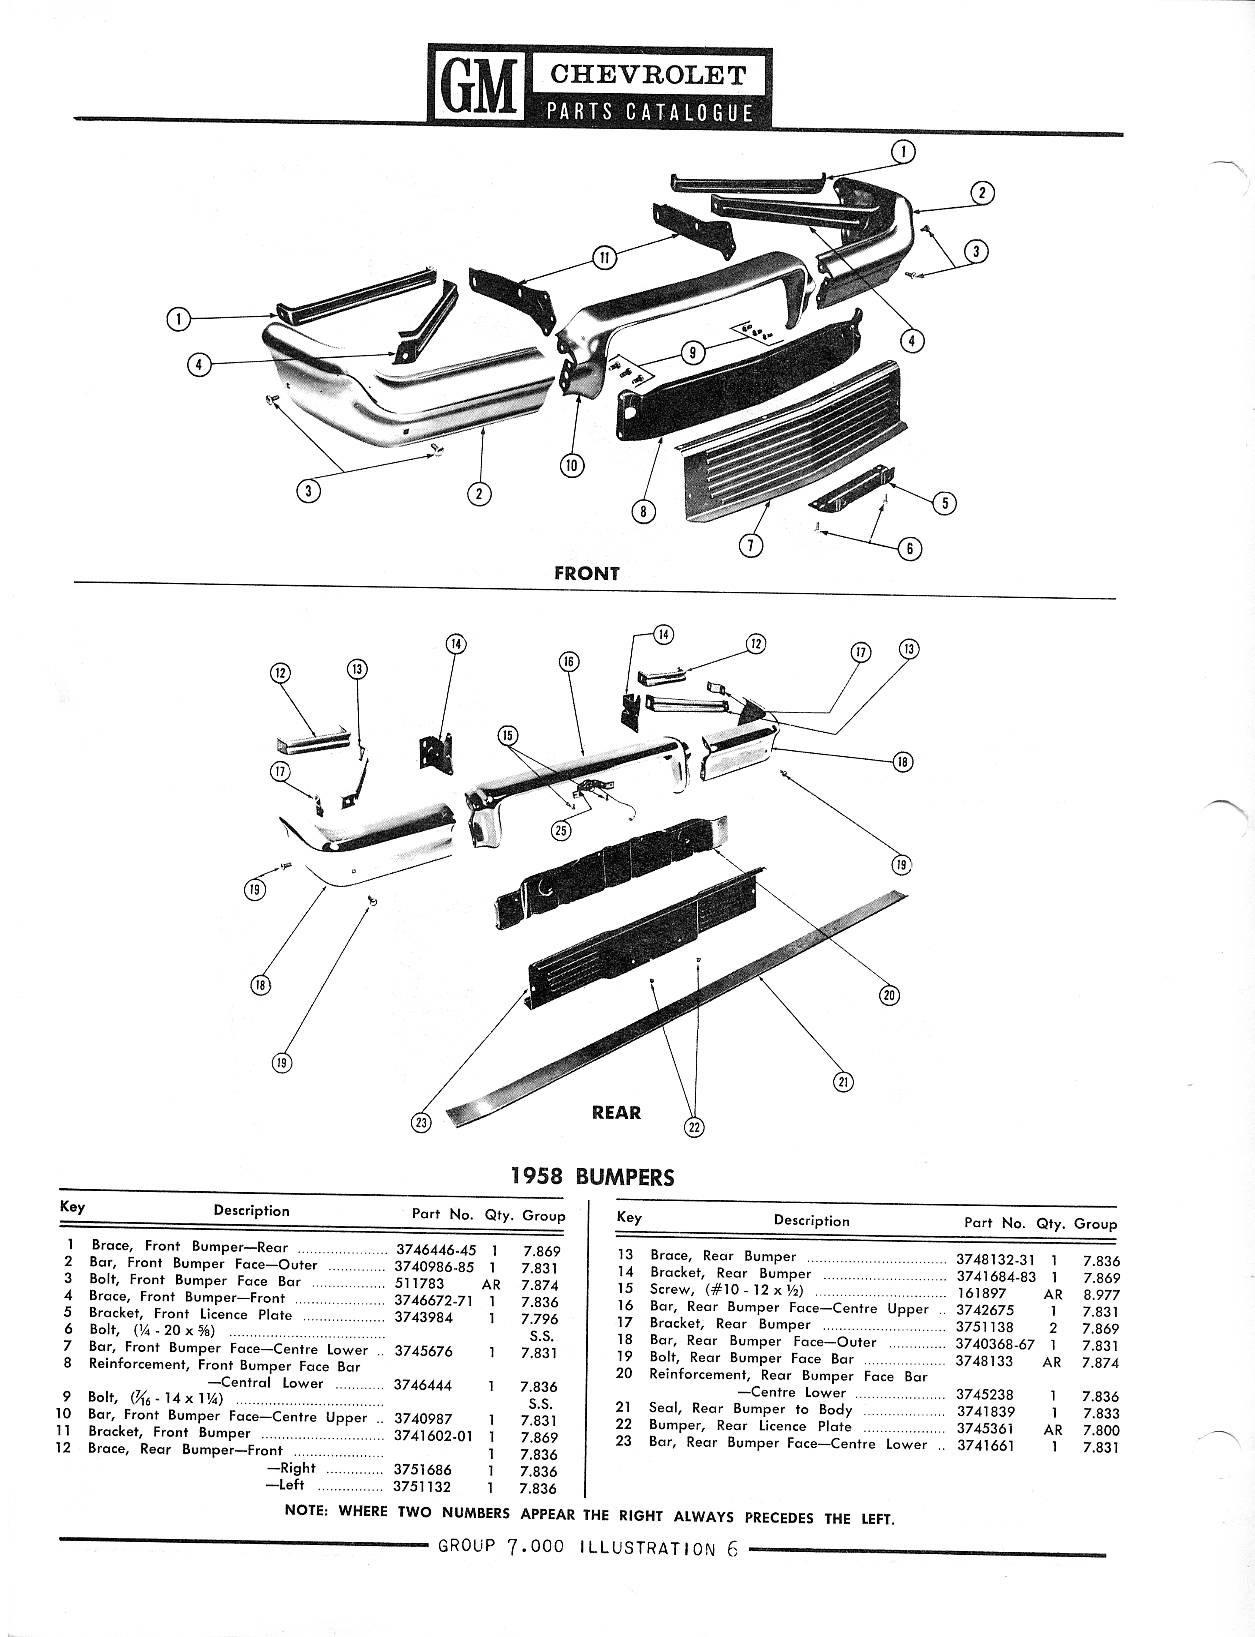 1958-1968 Chevrolet Parts Catalog / Image54.jpg